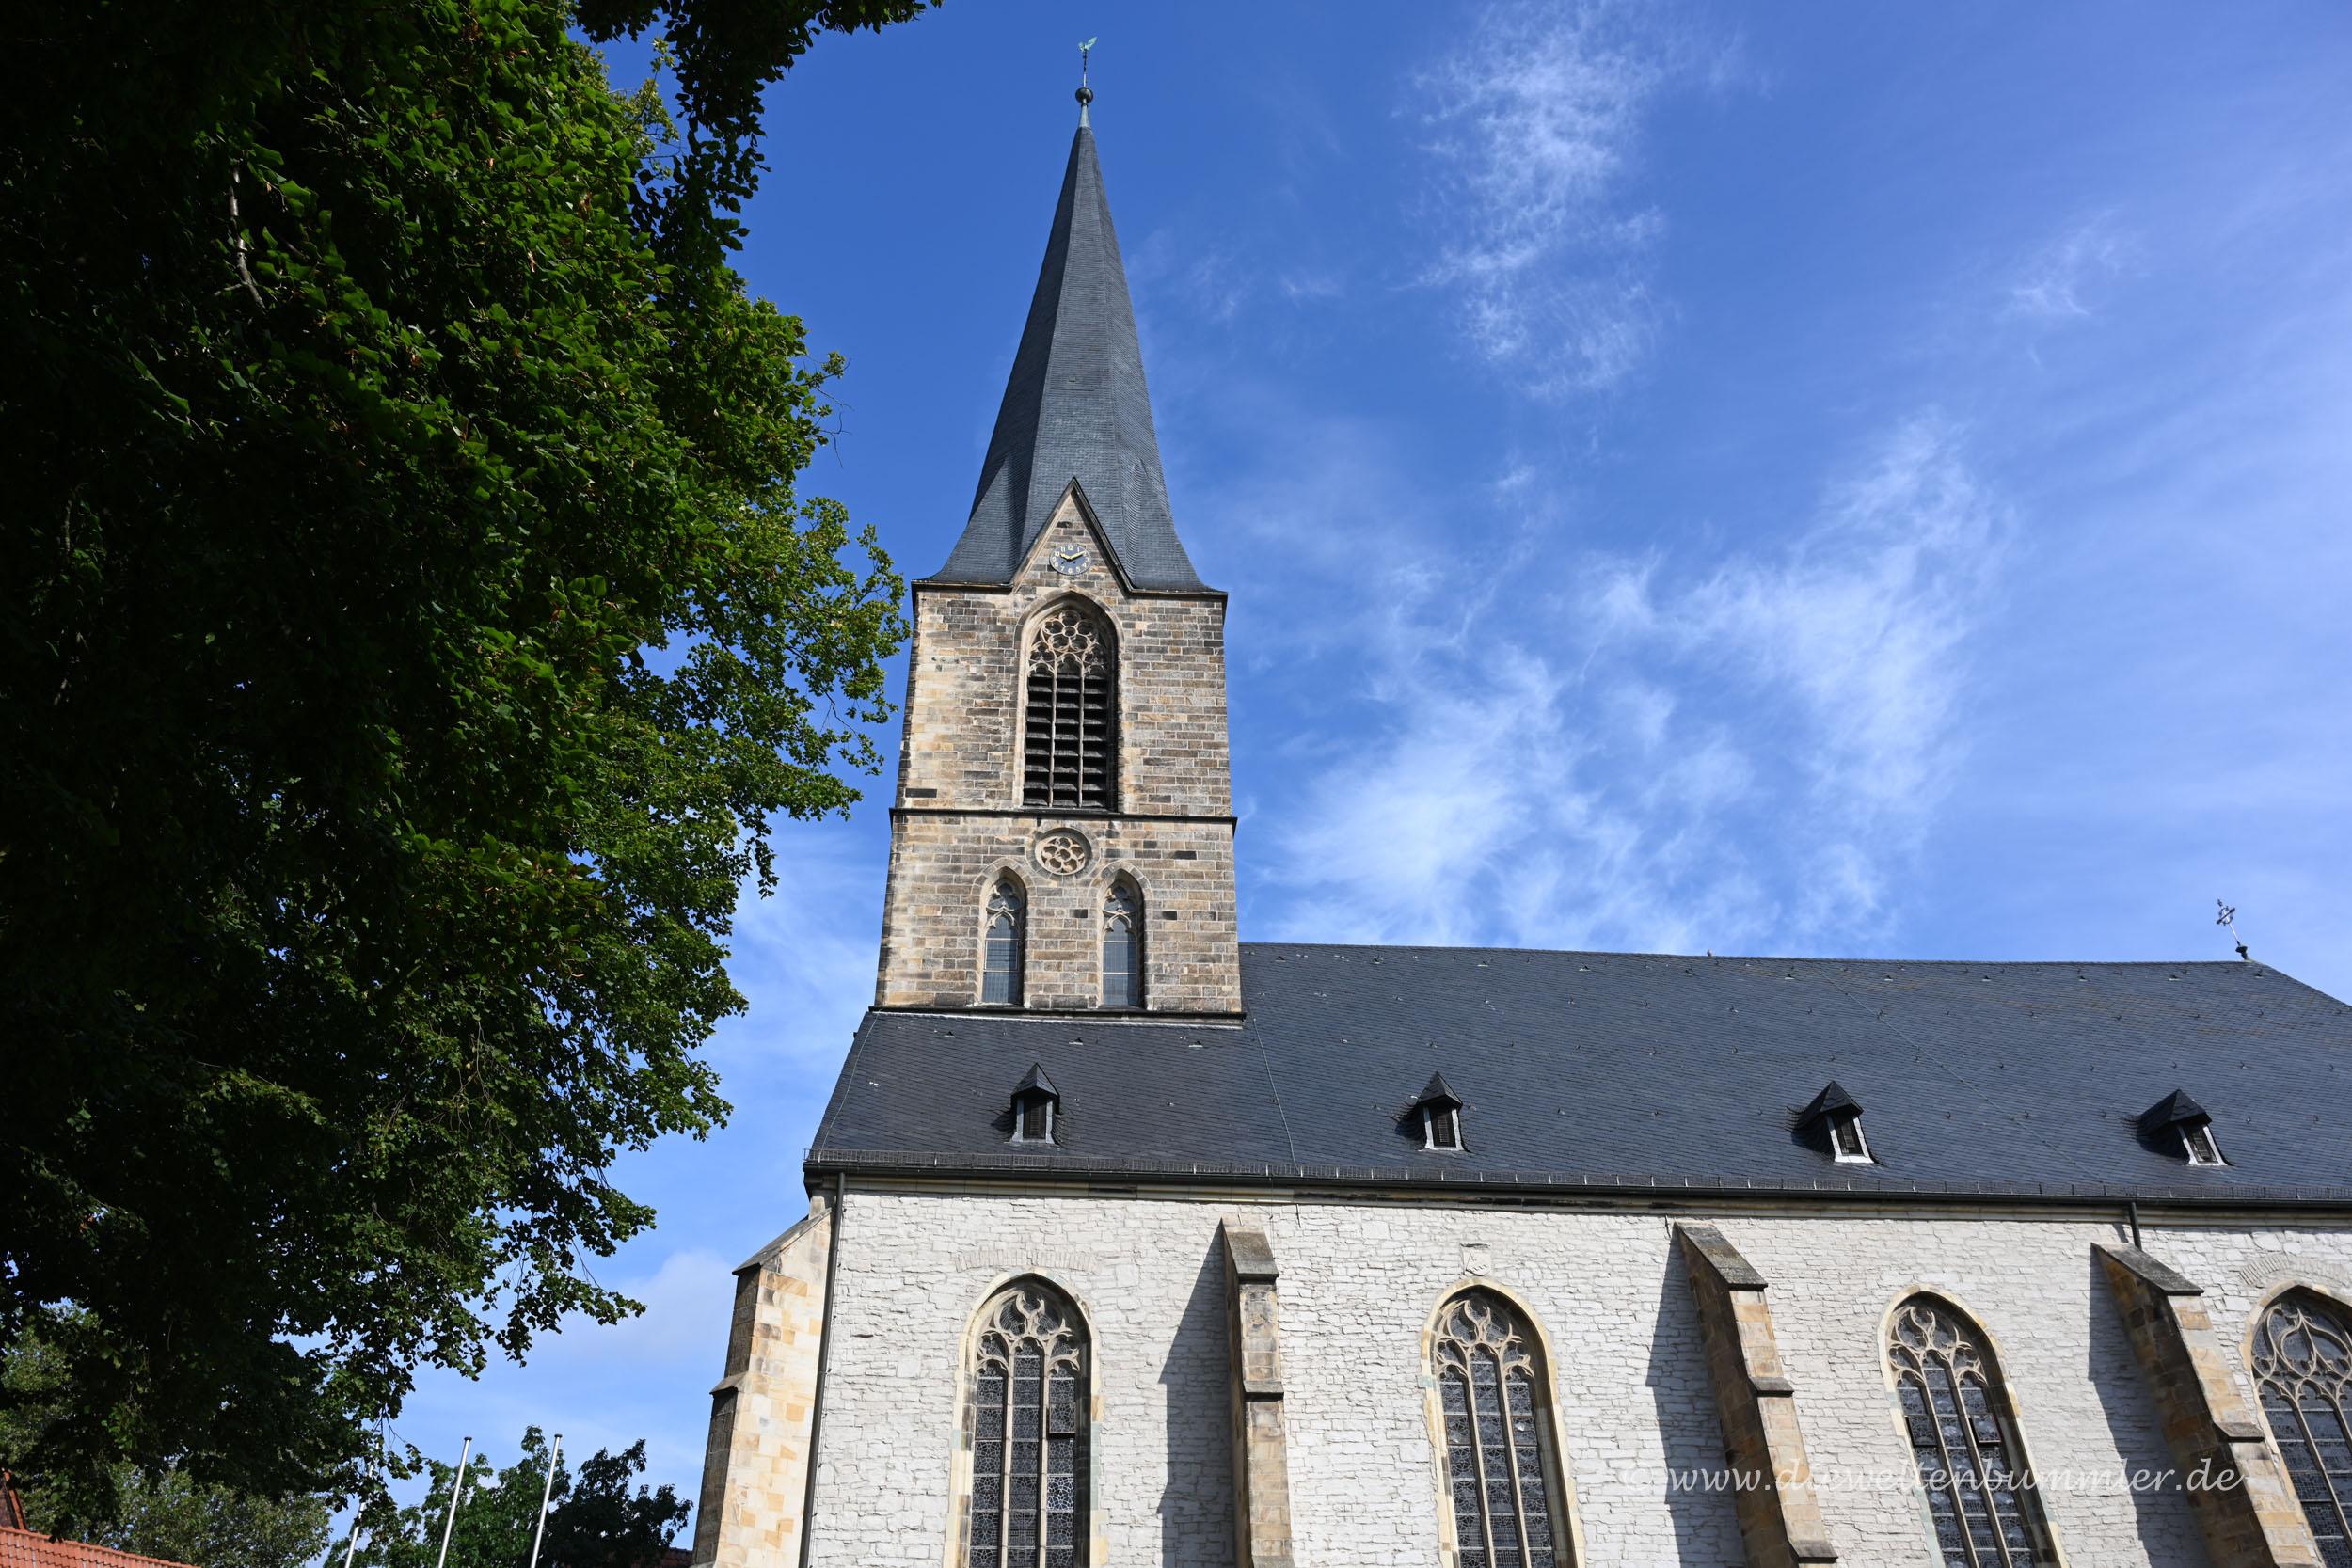 Kirche in Werne